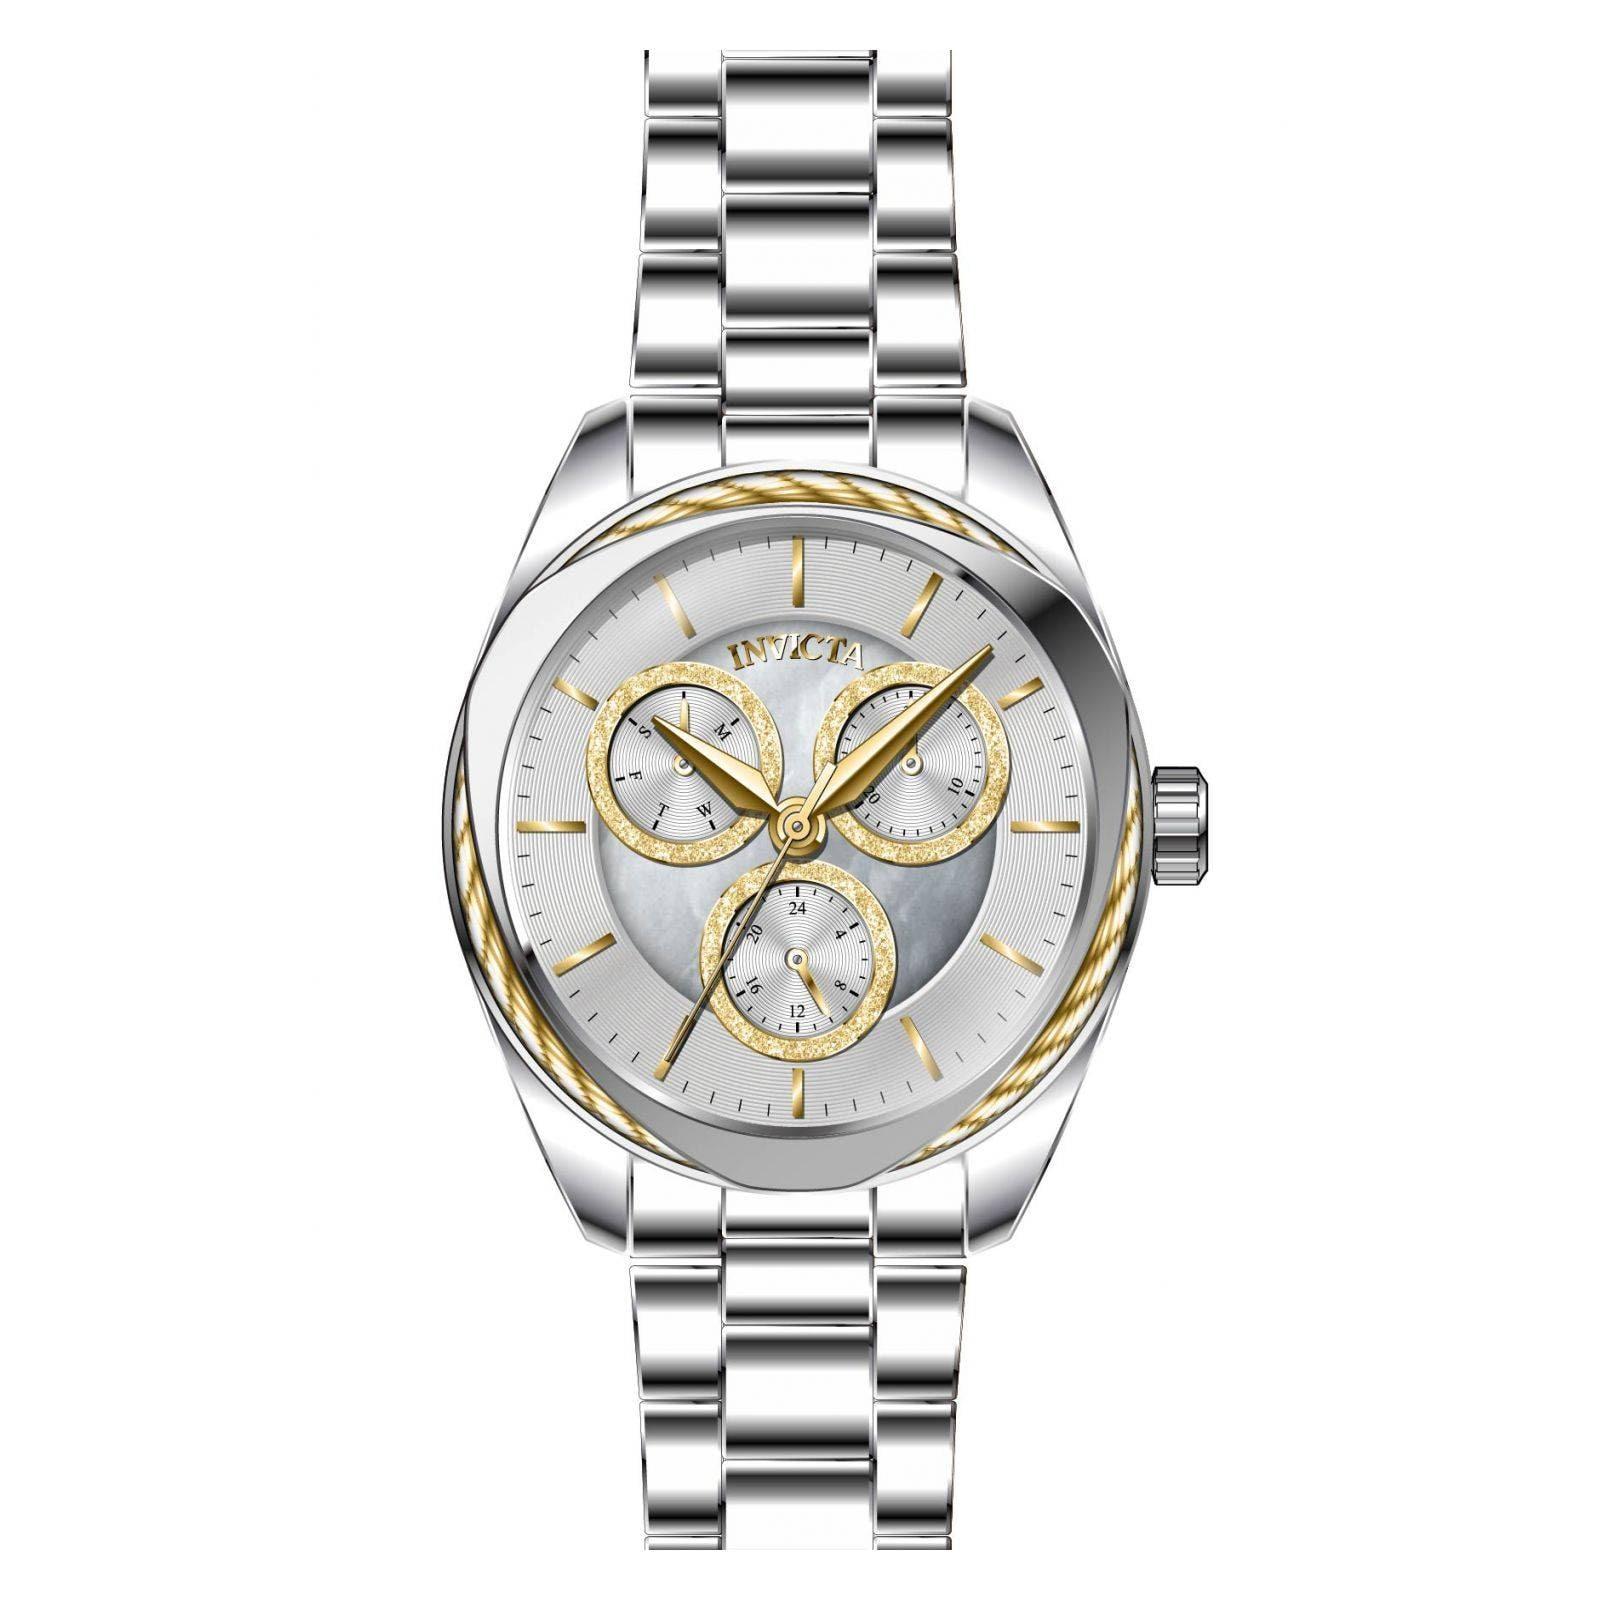 Reloj Invicta 31222 Plateado para Mujer